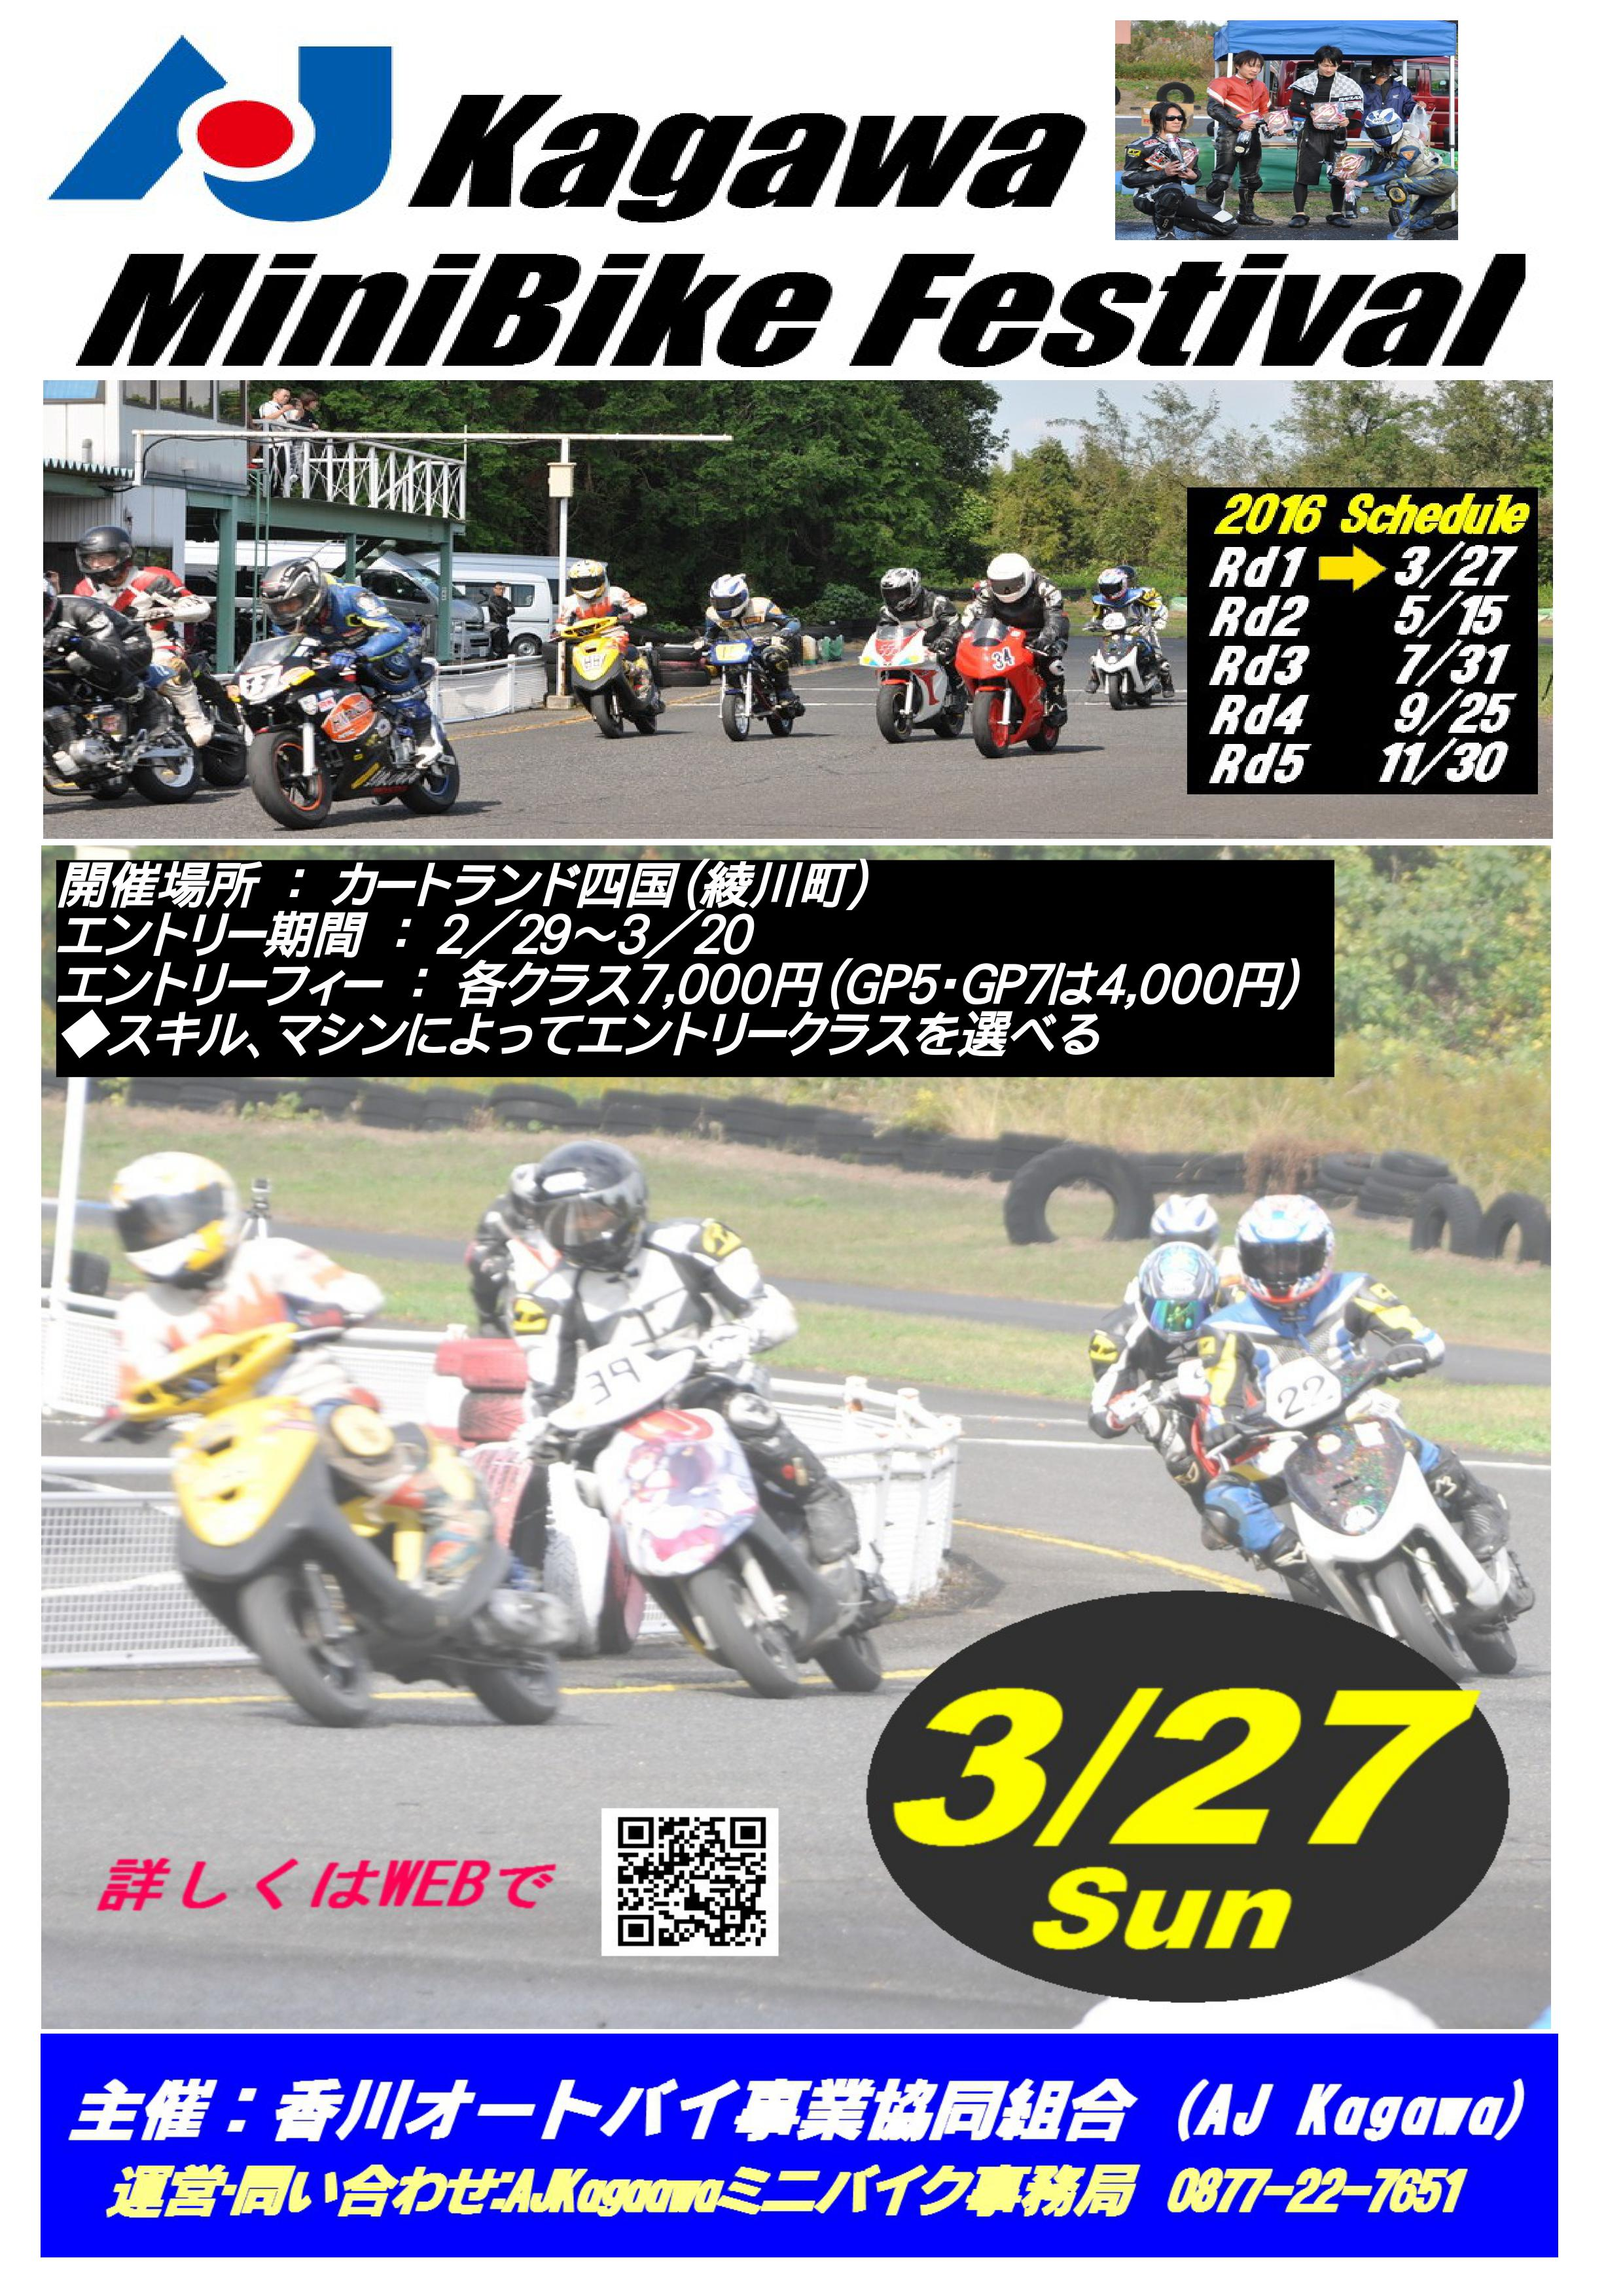 AJ Kagawa MiniBike Festival